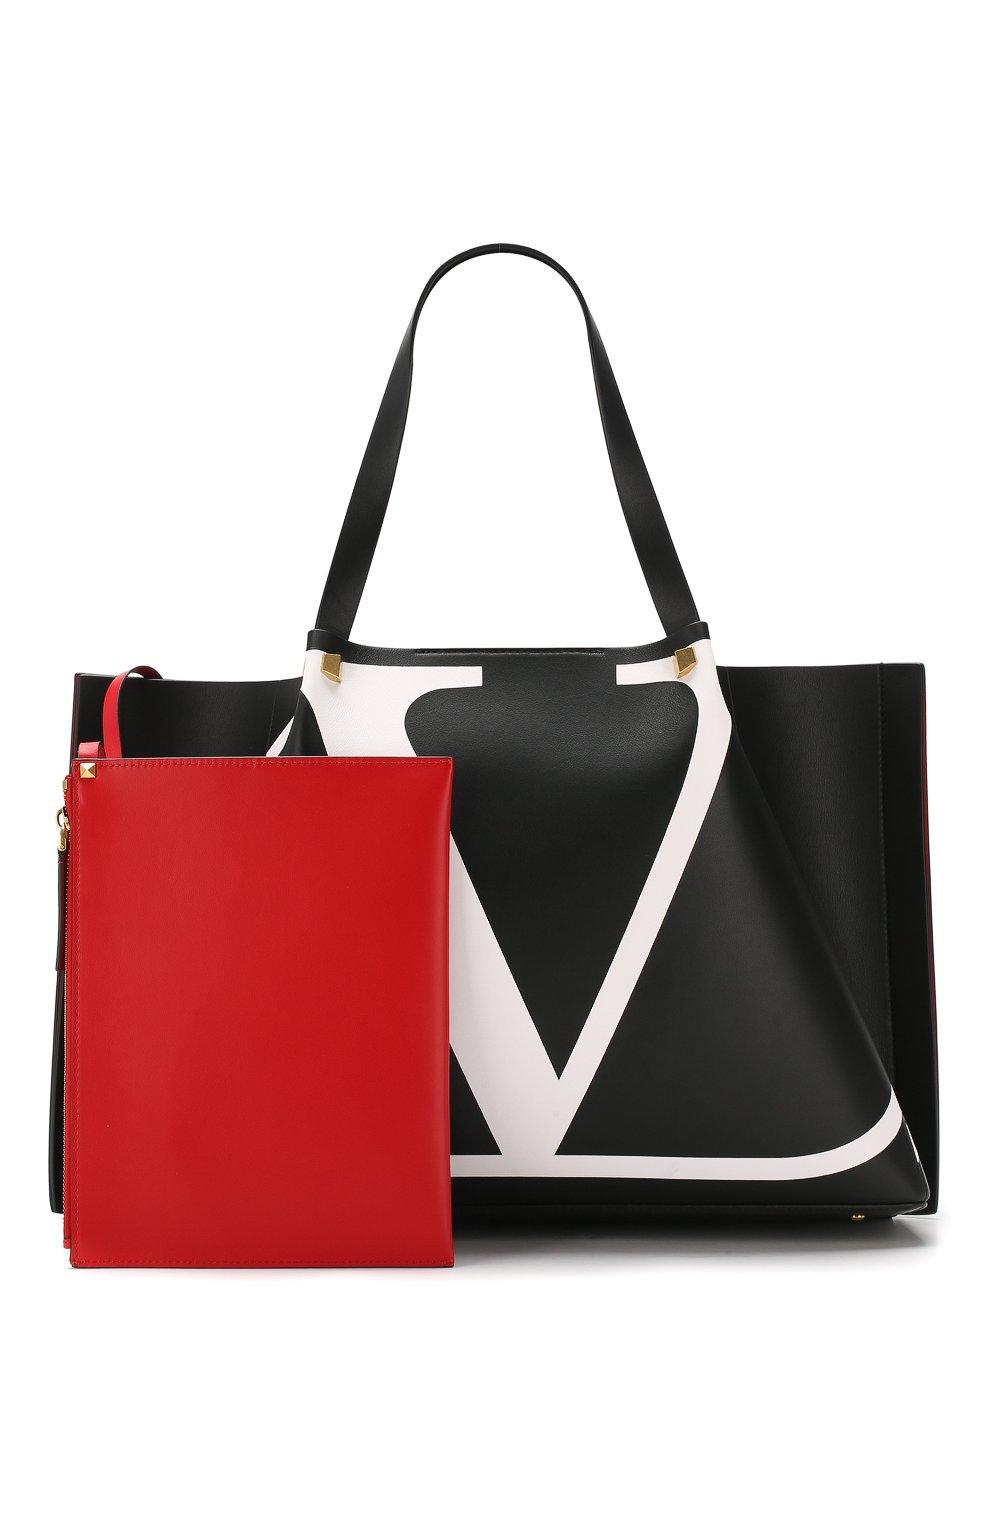 Сумка-тоут Valentino Garavani Go Logo Escape large Valentino черная цвета | Фото №5